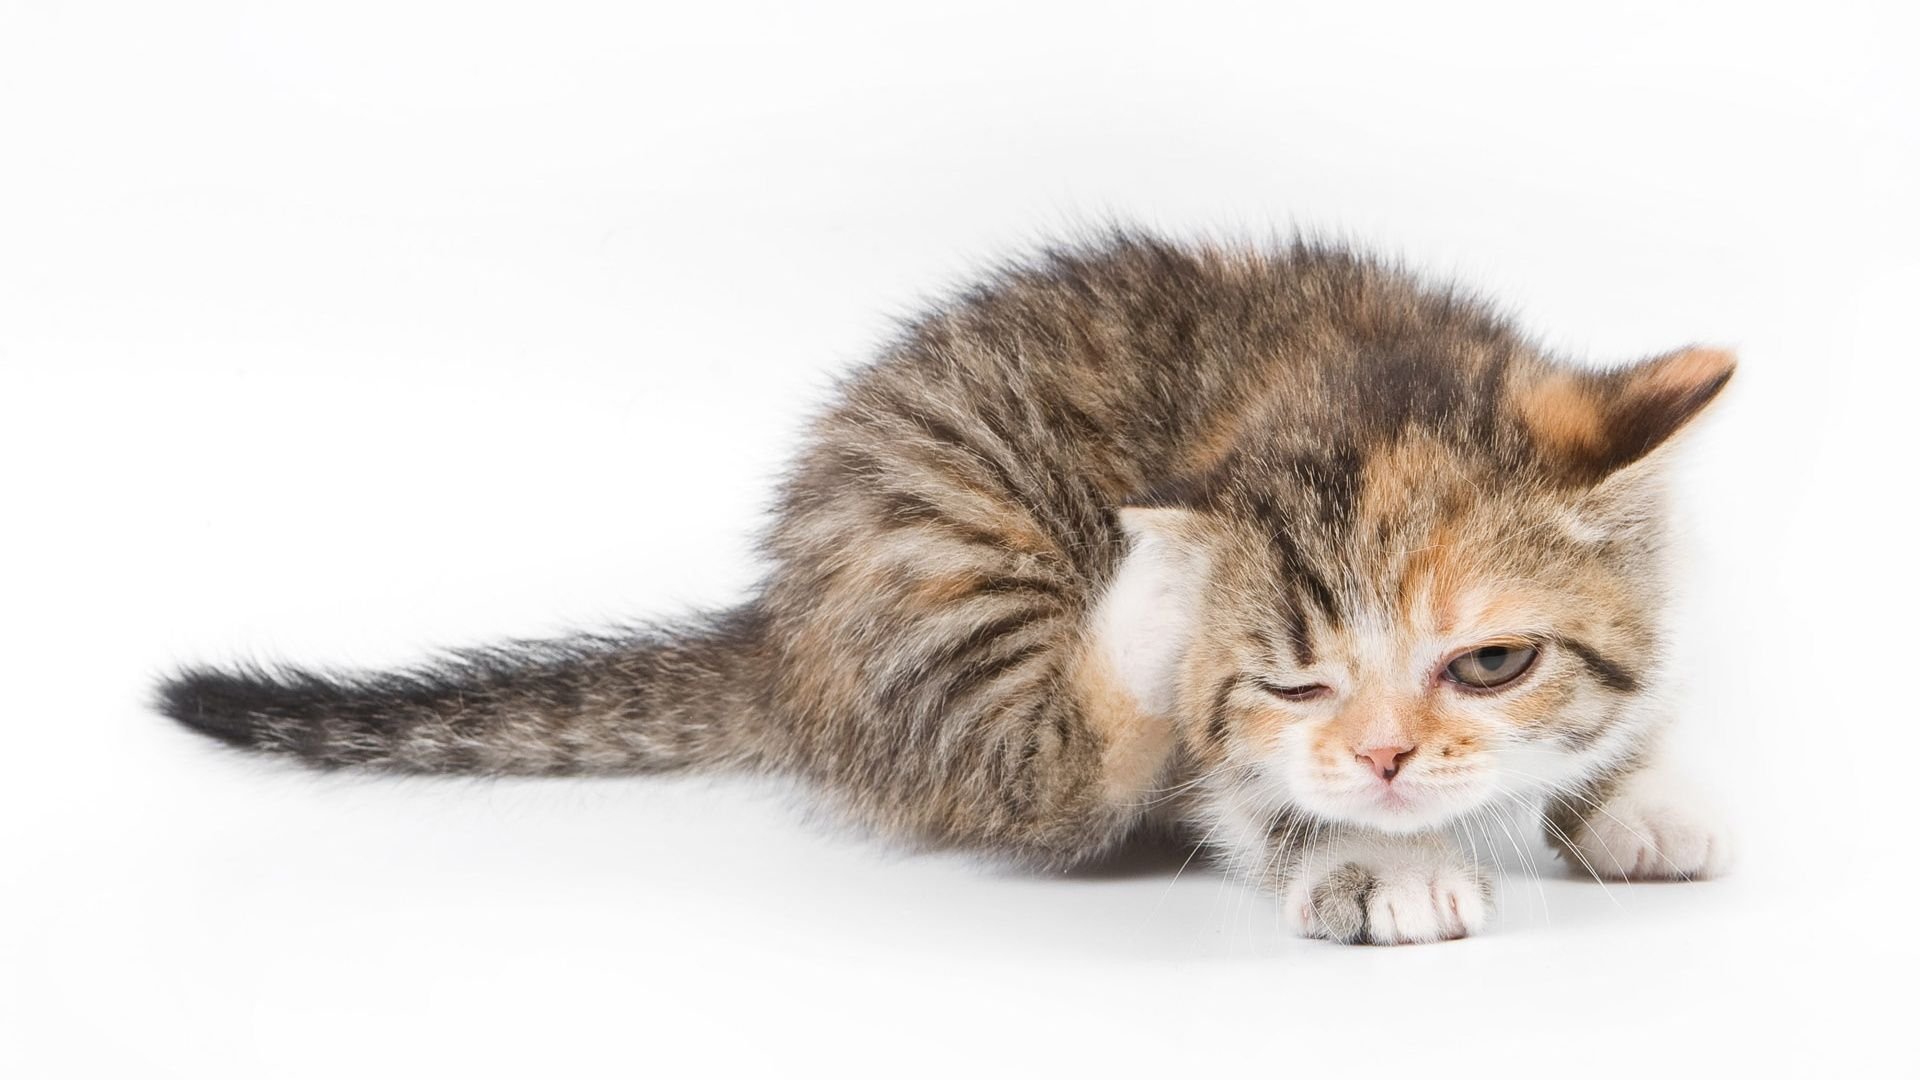 Image Search Results For Wallpaper 1920 X 1080 Cute 画像あり 可愛すぎる動物 面白い猫の写真 動物